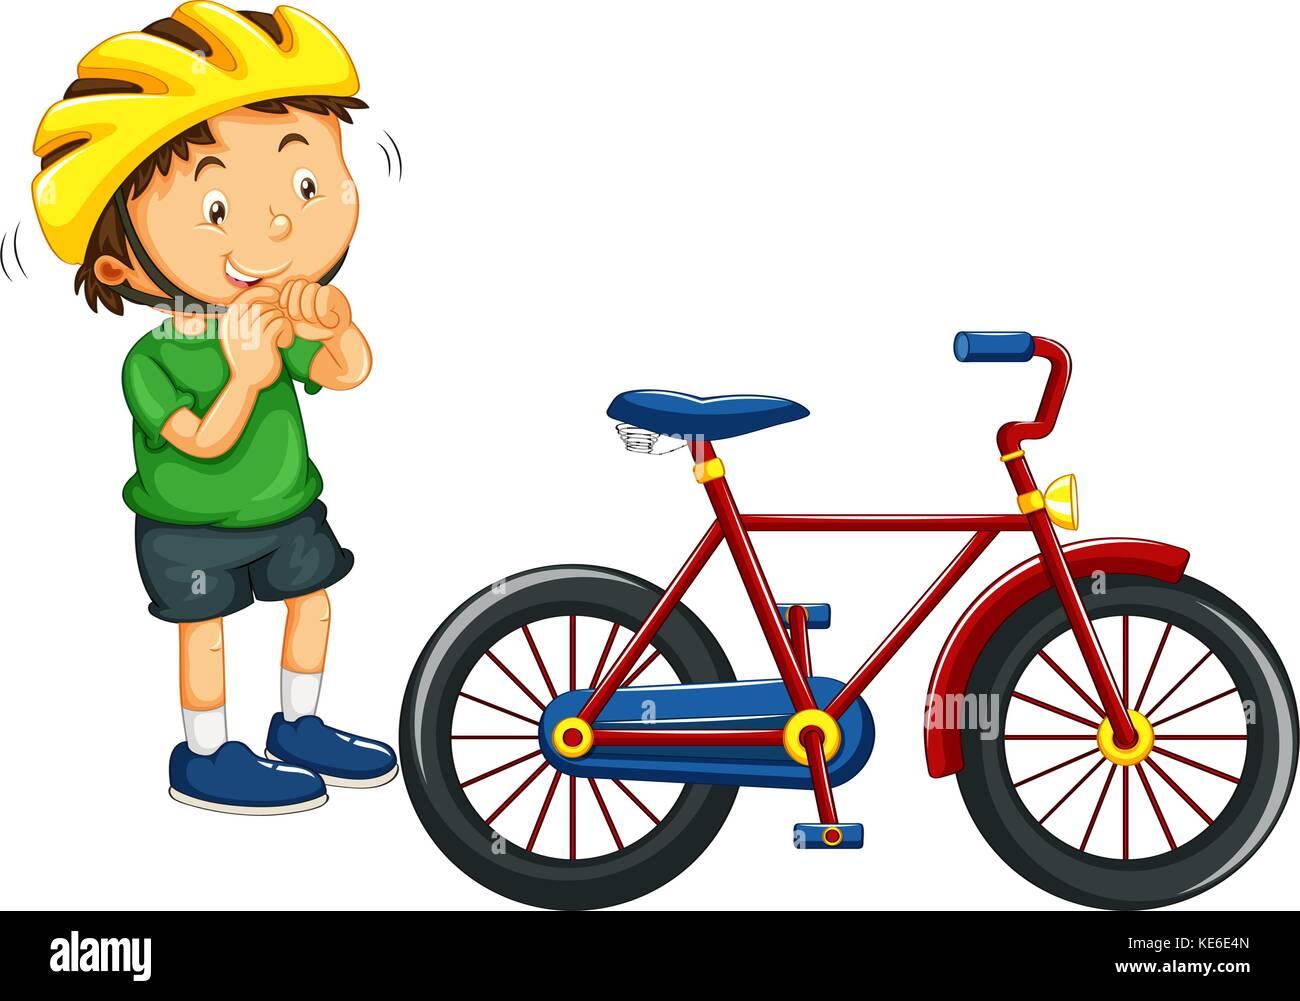 cartoon image kid riding